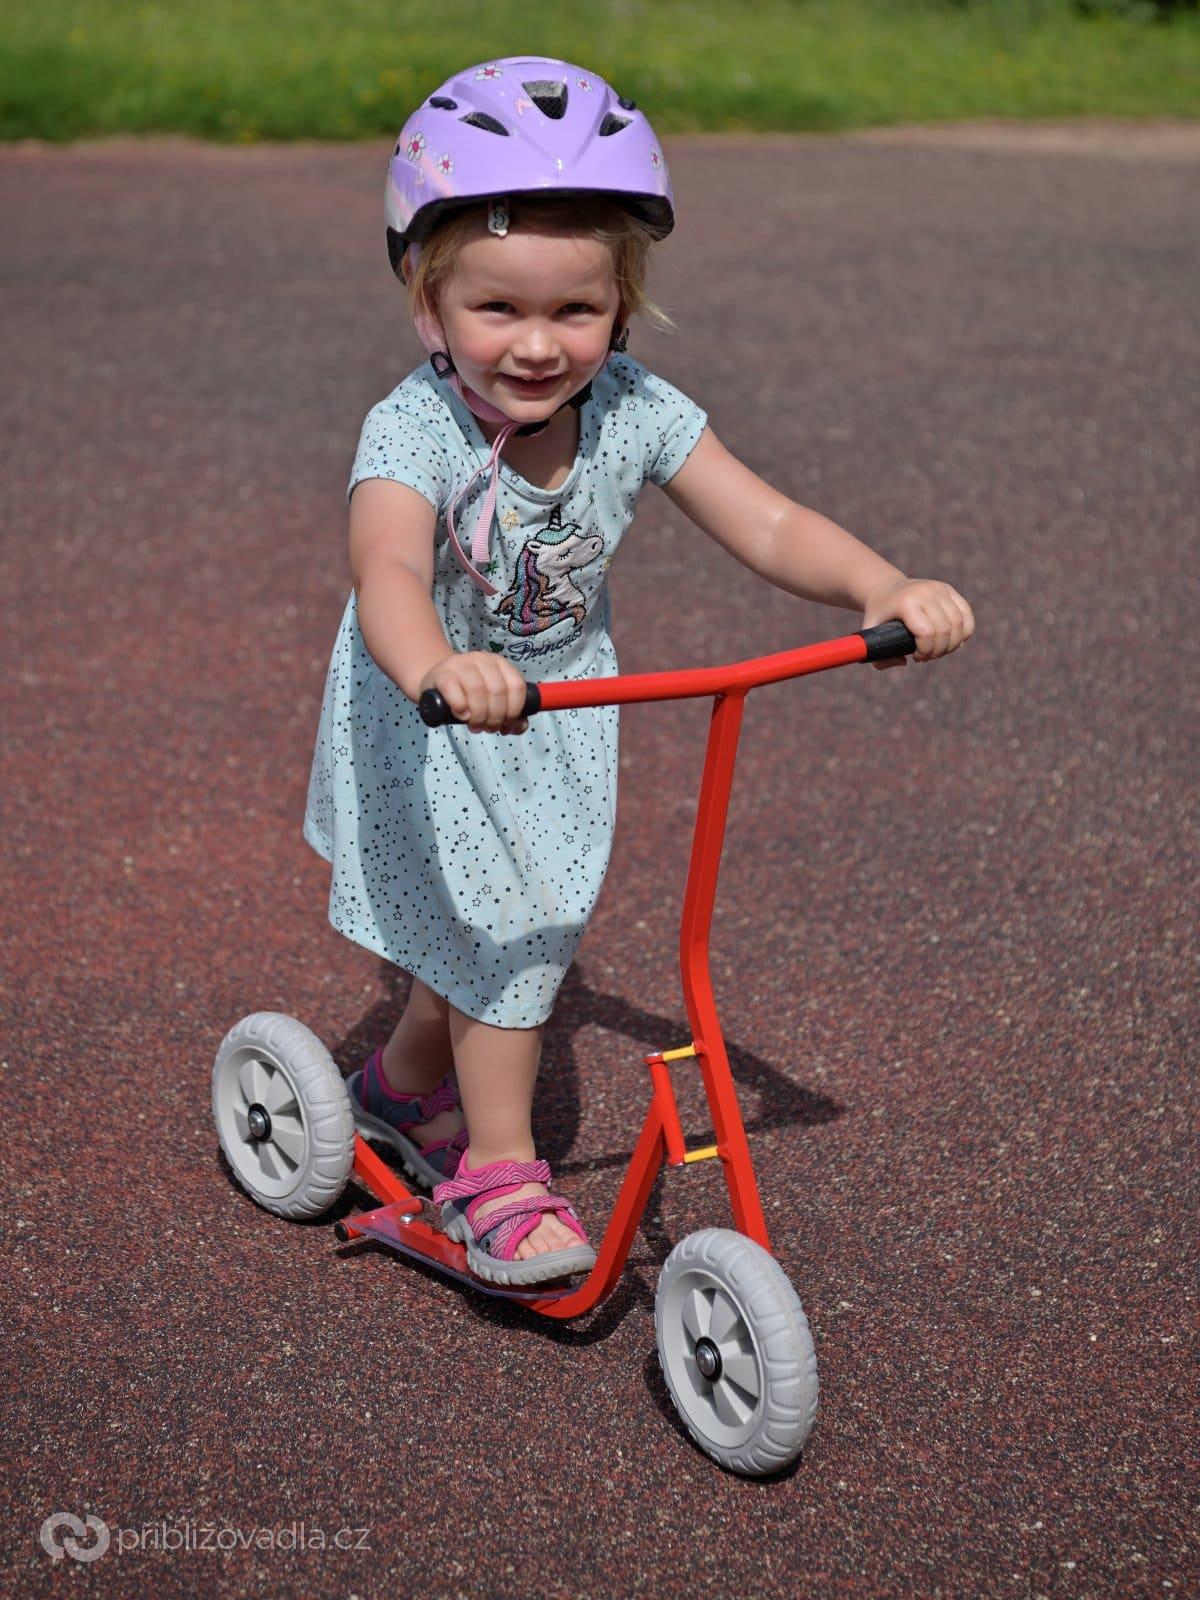 Adélka na K-bike v roce 2020